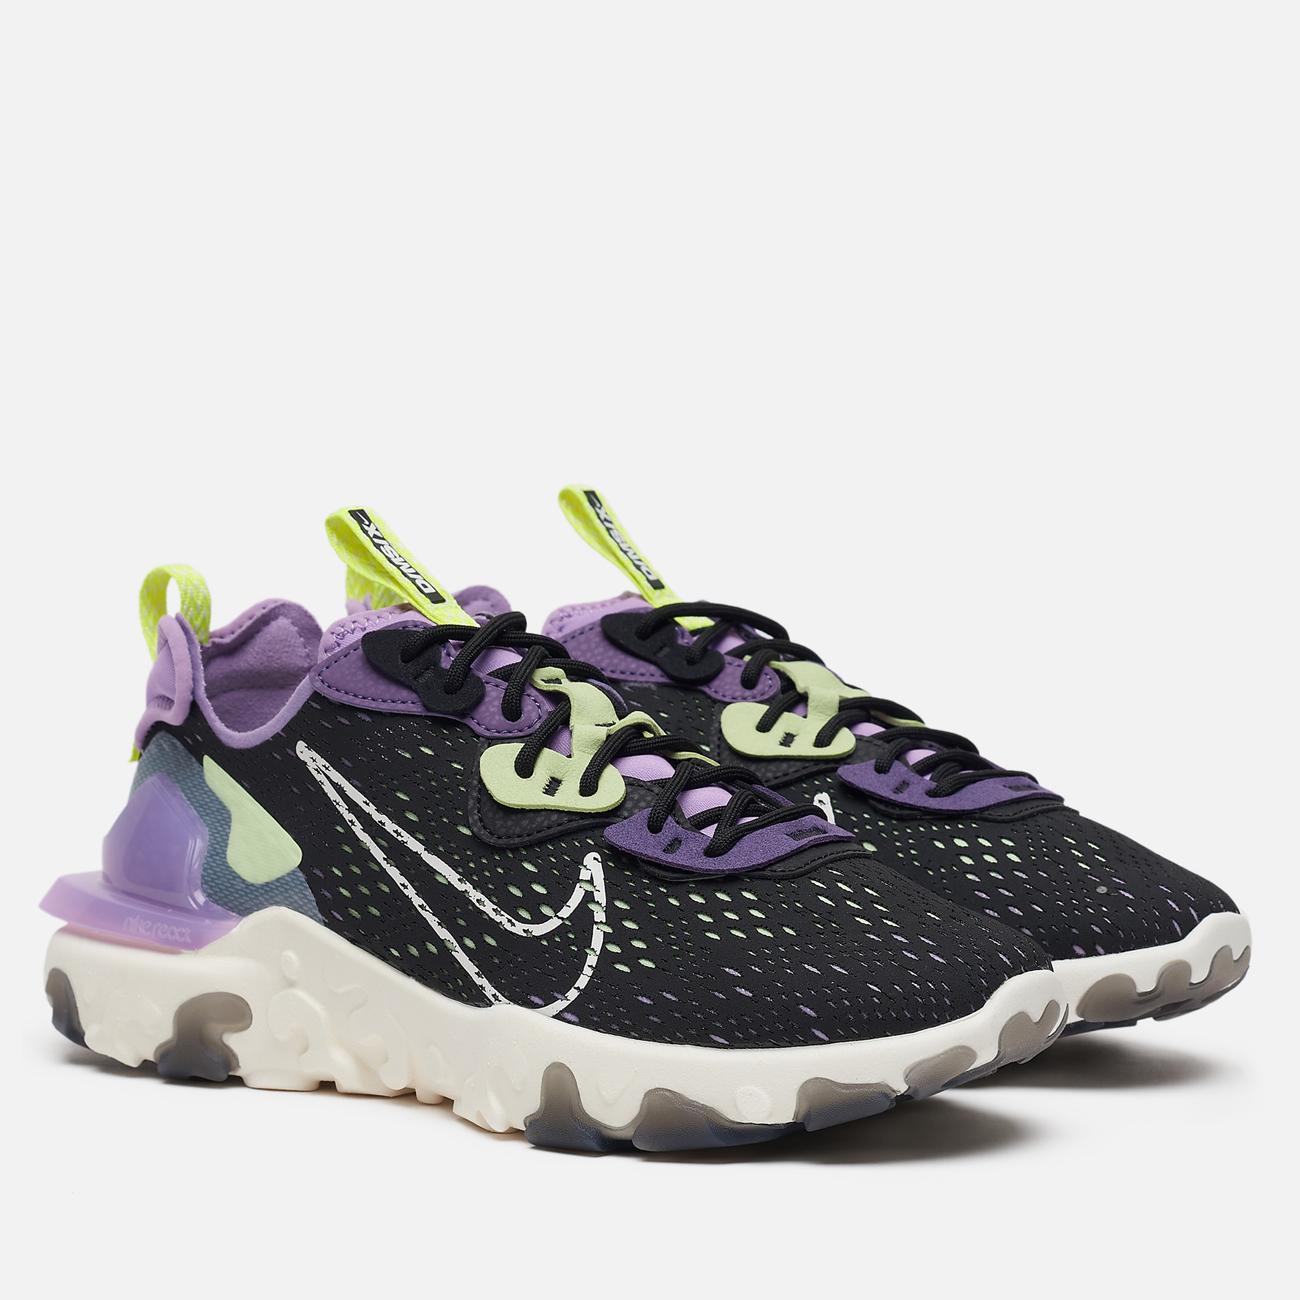 Мужские кроссовки Nike React Vision Black/Sail/Dark Smoke Grey/Gravity Purple